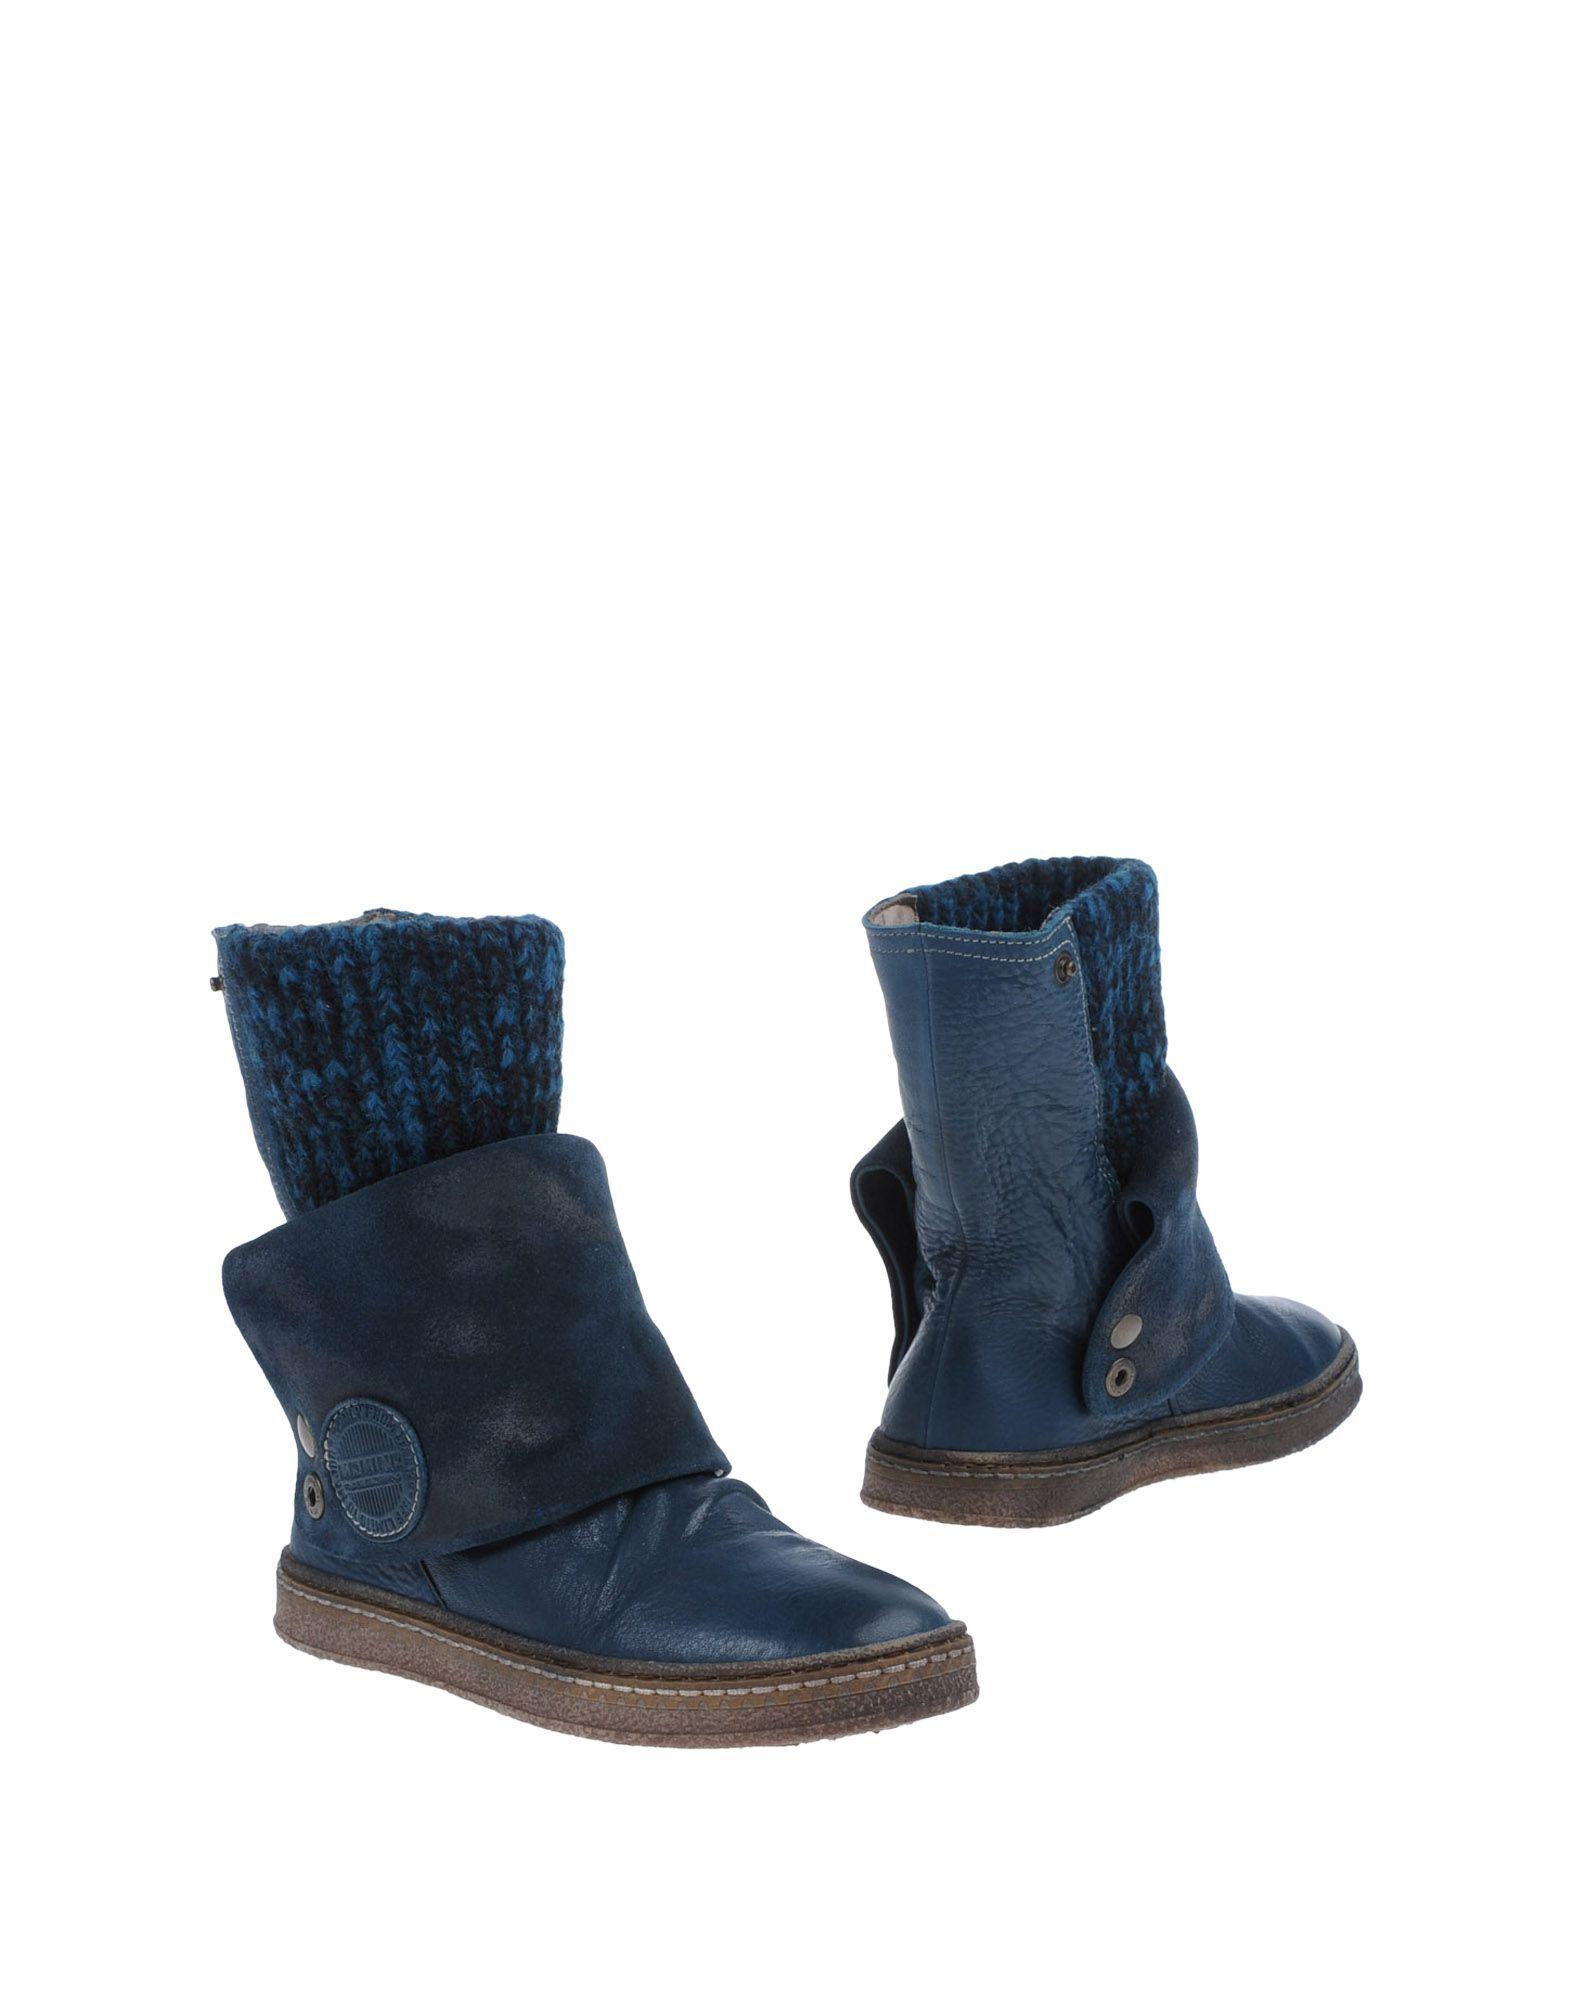 sports shoes b2a2e d942a 4251898357a0f3797e19527220e391f1.jpg